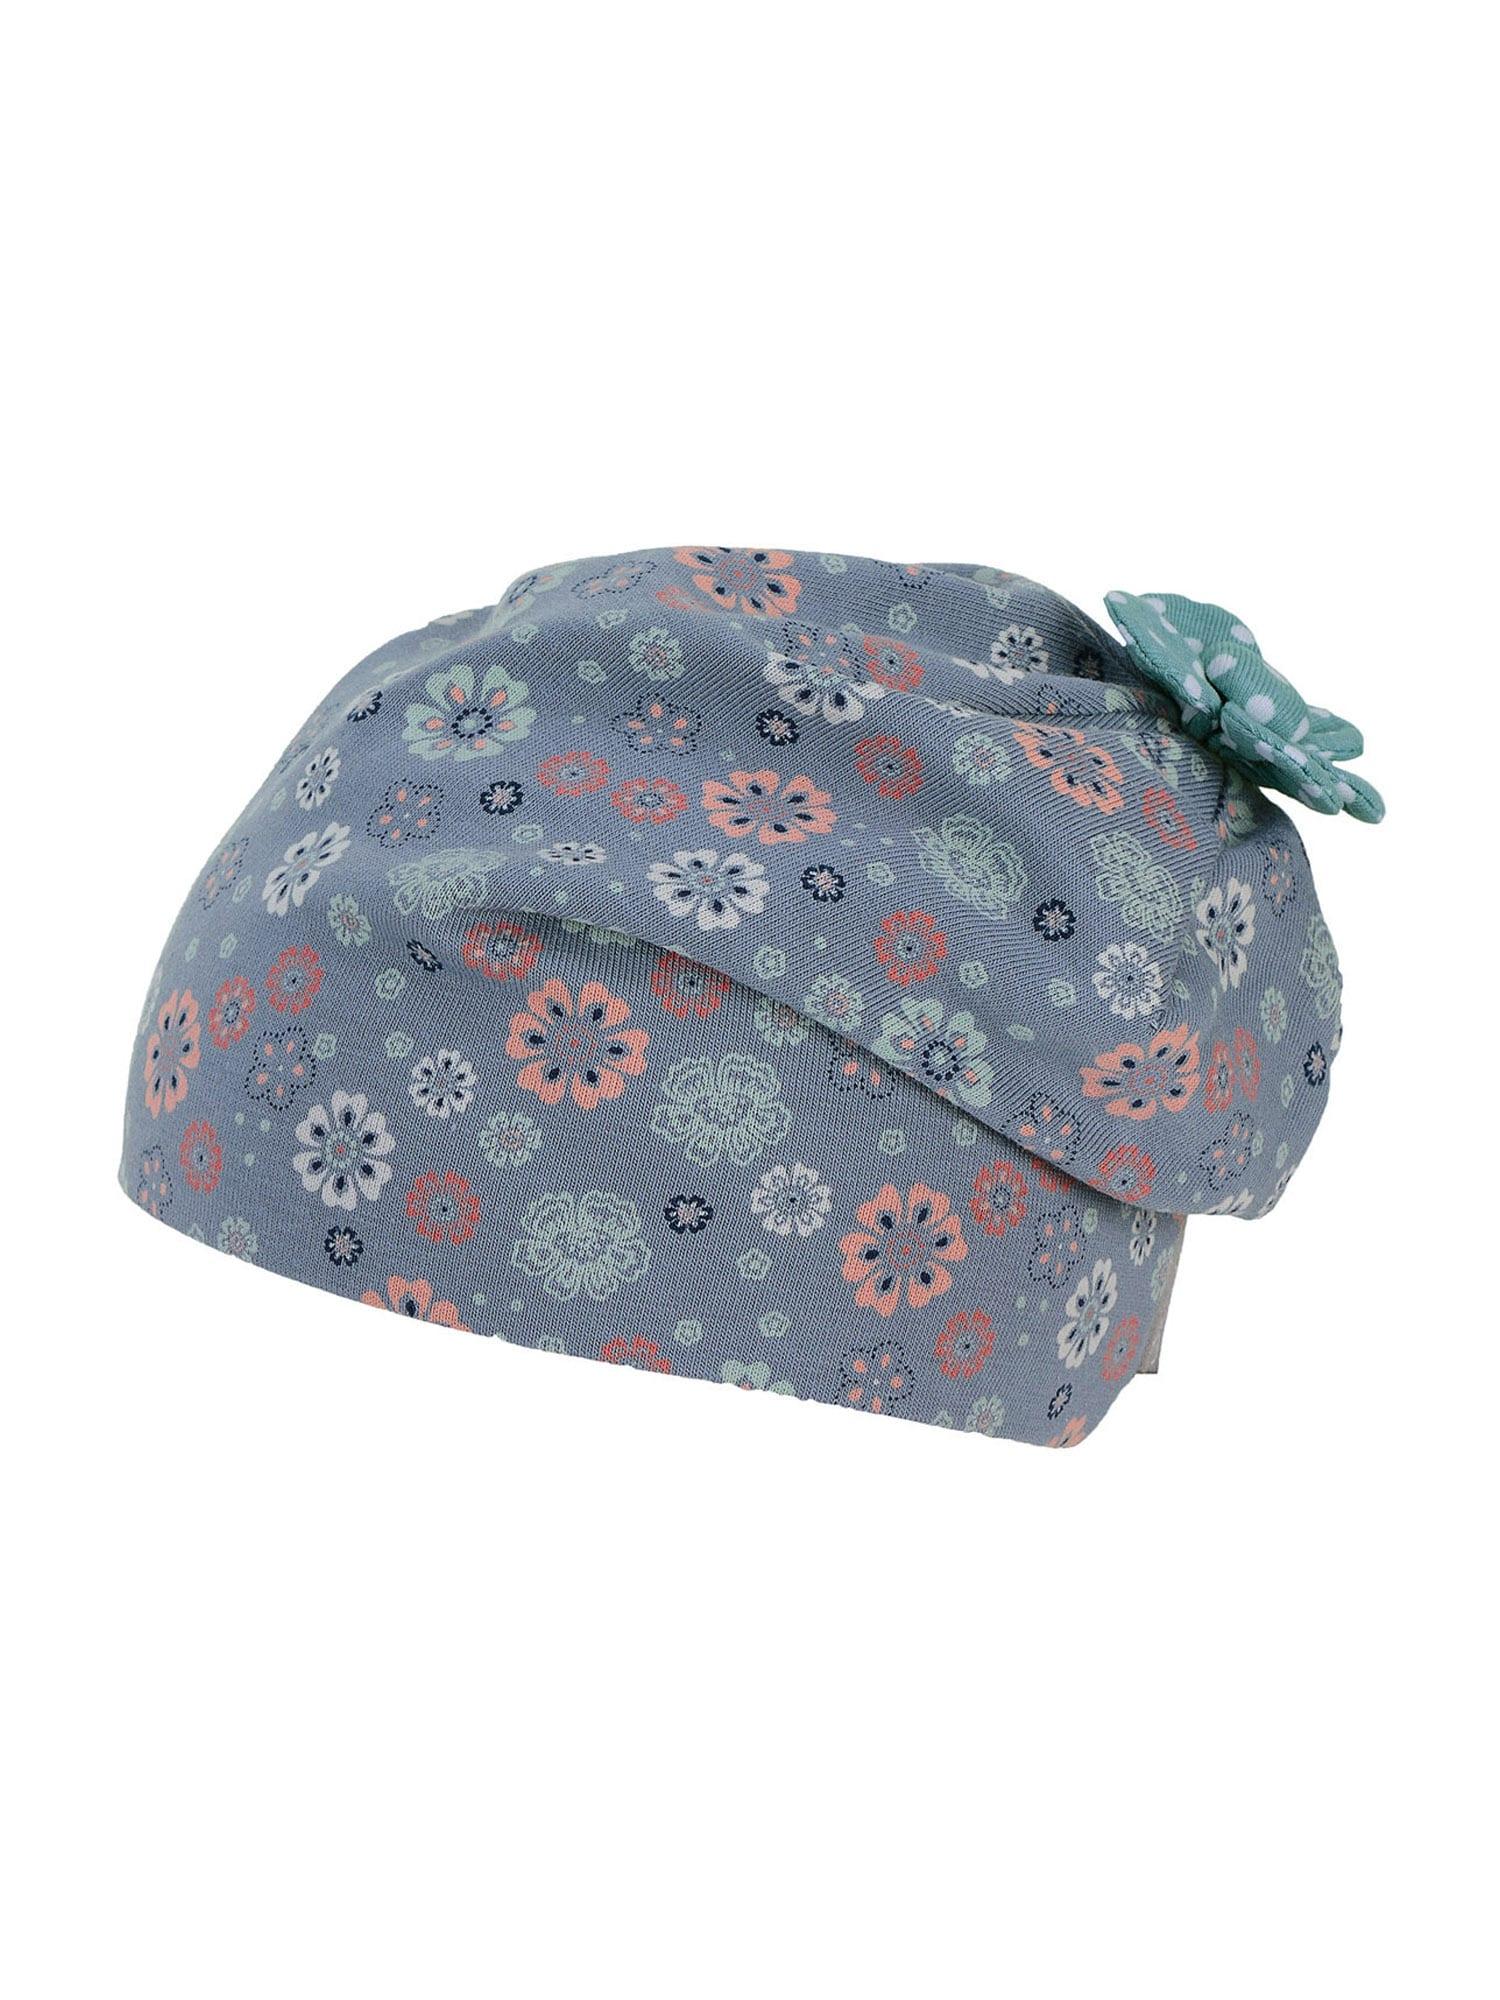 STERNTALER Megzta kepurė pastelinė mėlyna / opalo / abrikosų spalva / tamsiai mėlyna